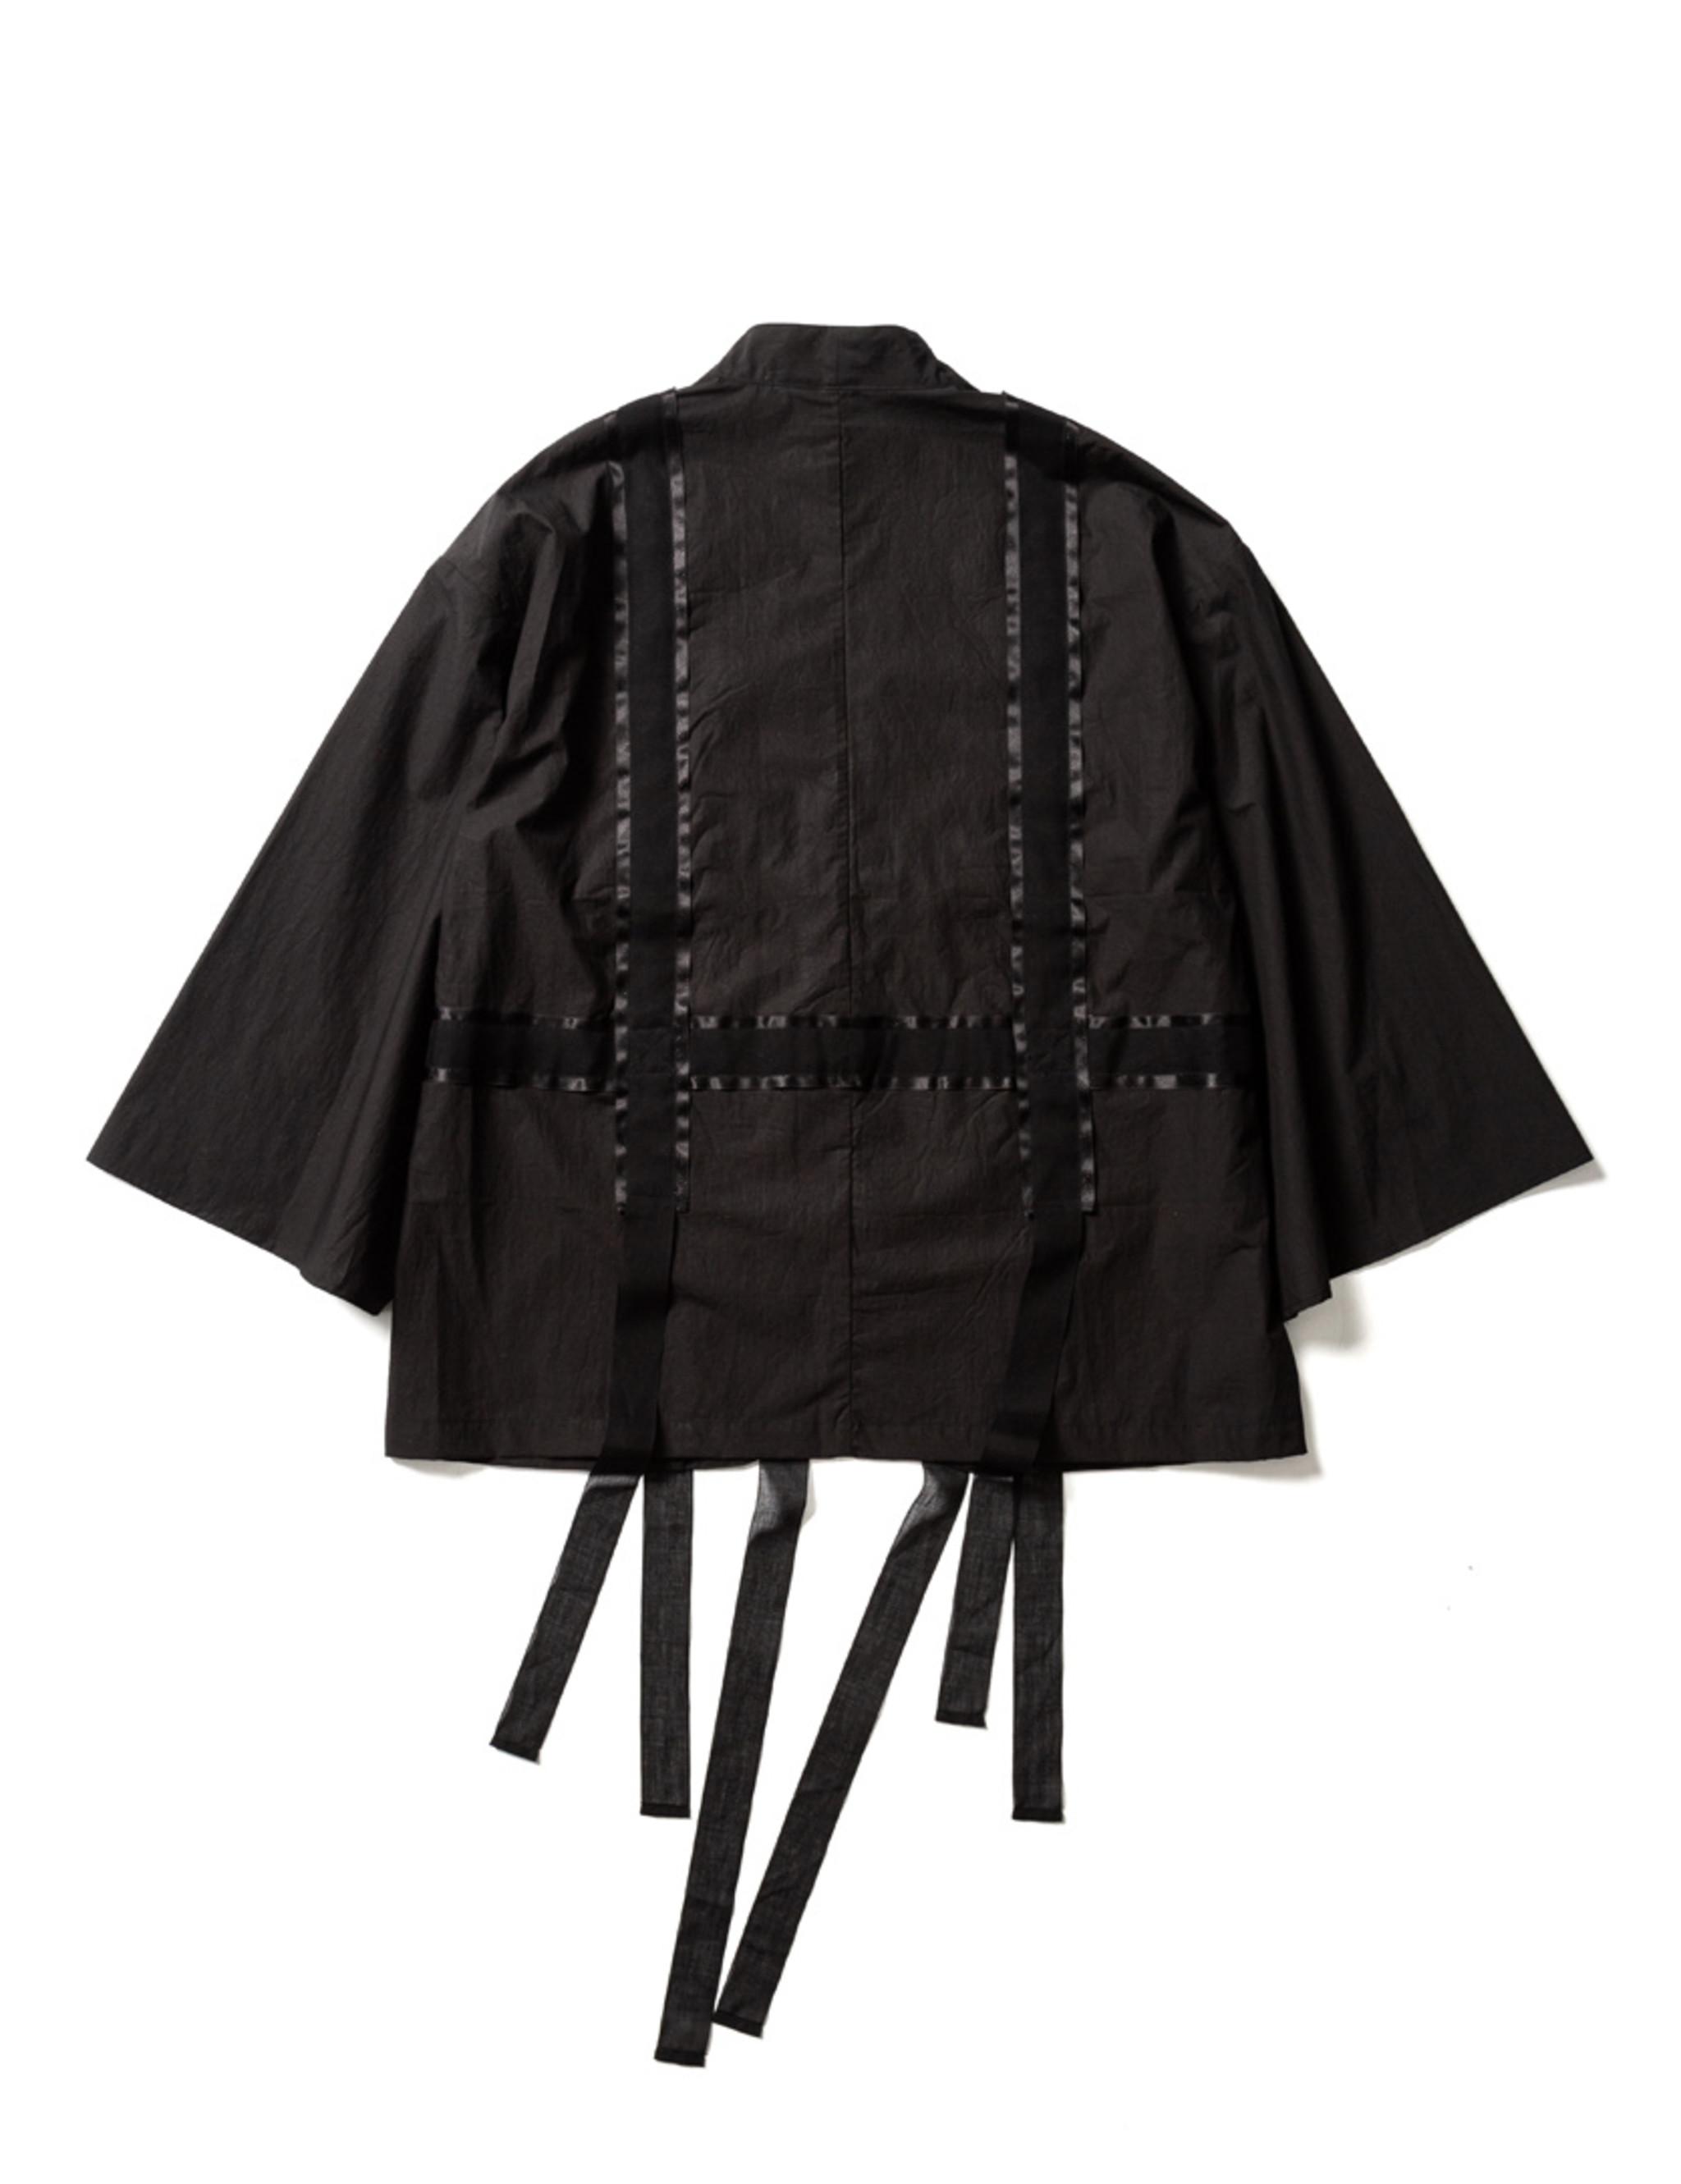 Sasquatchfabrix. ORIENTAL CARDIGAN - Black